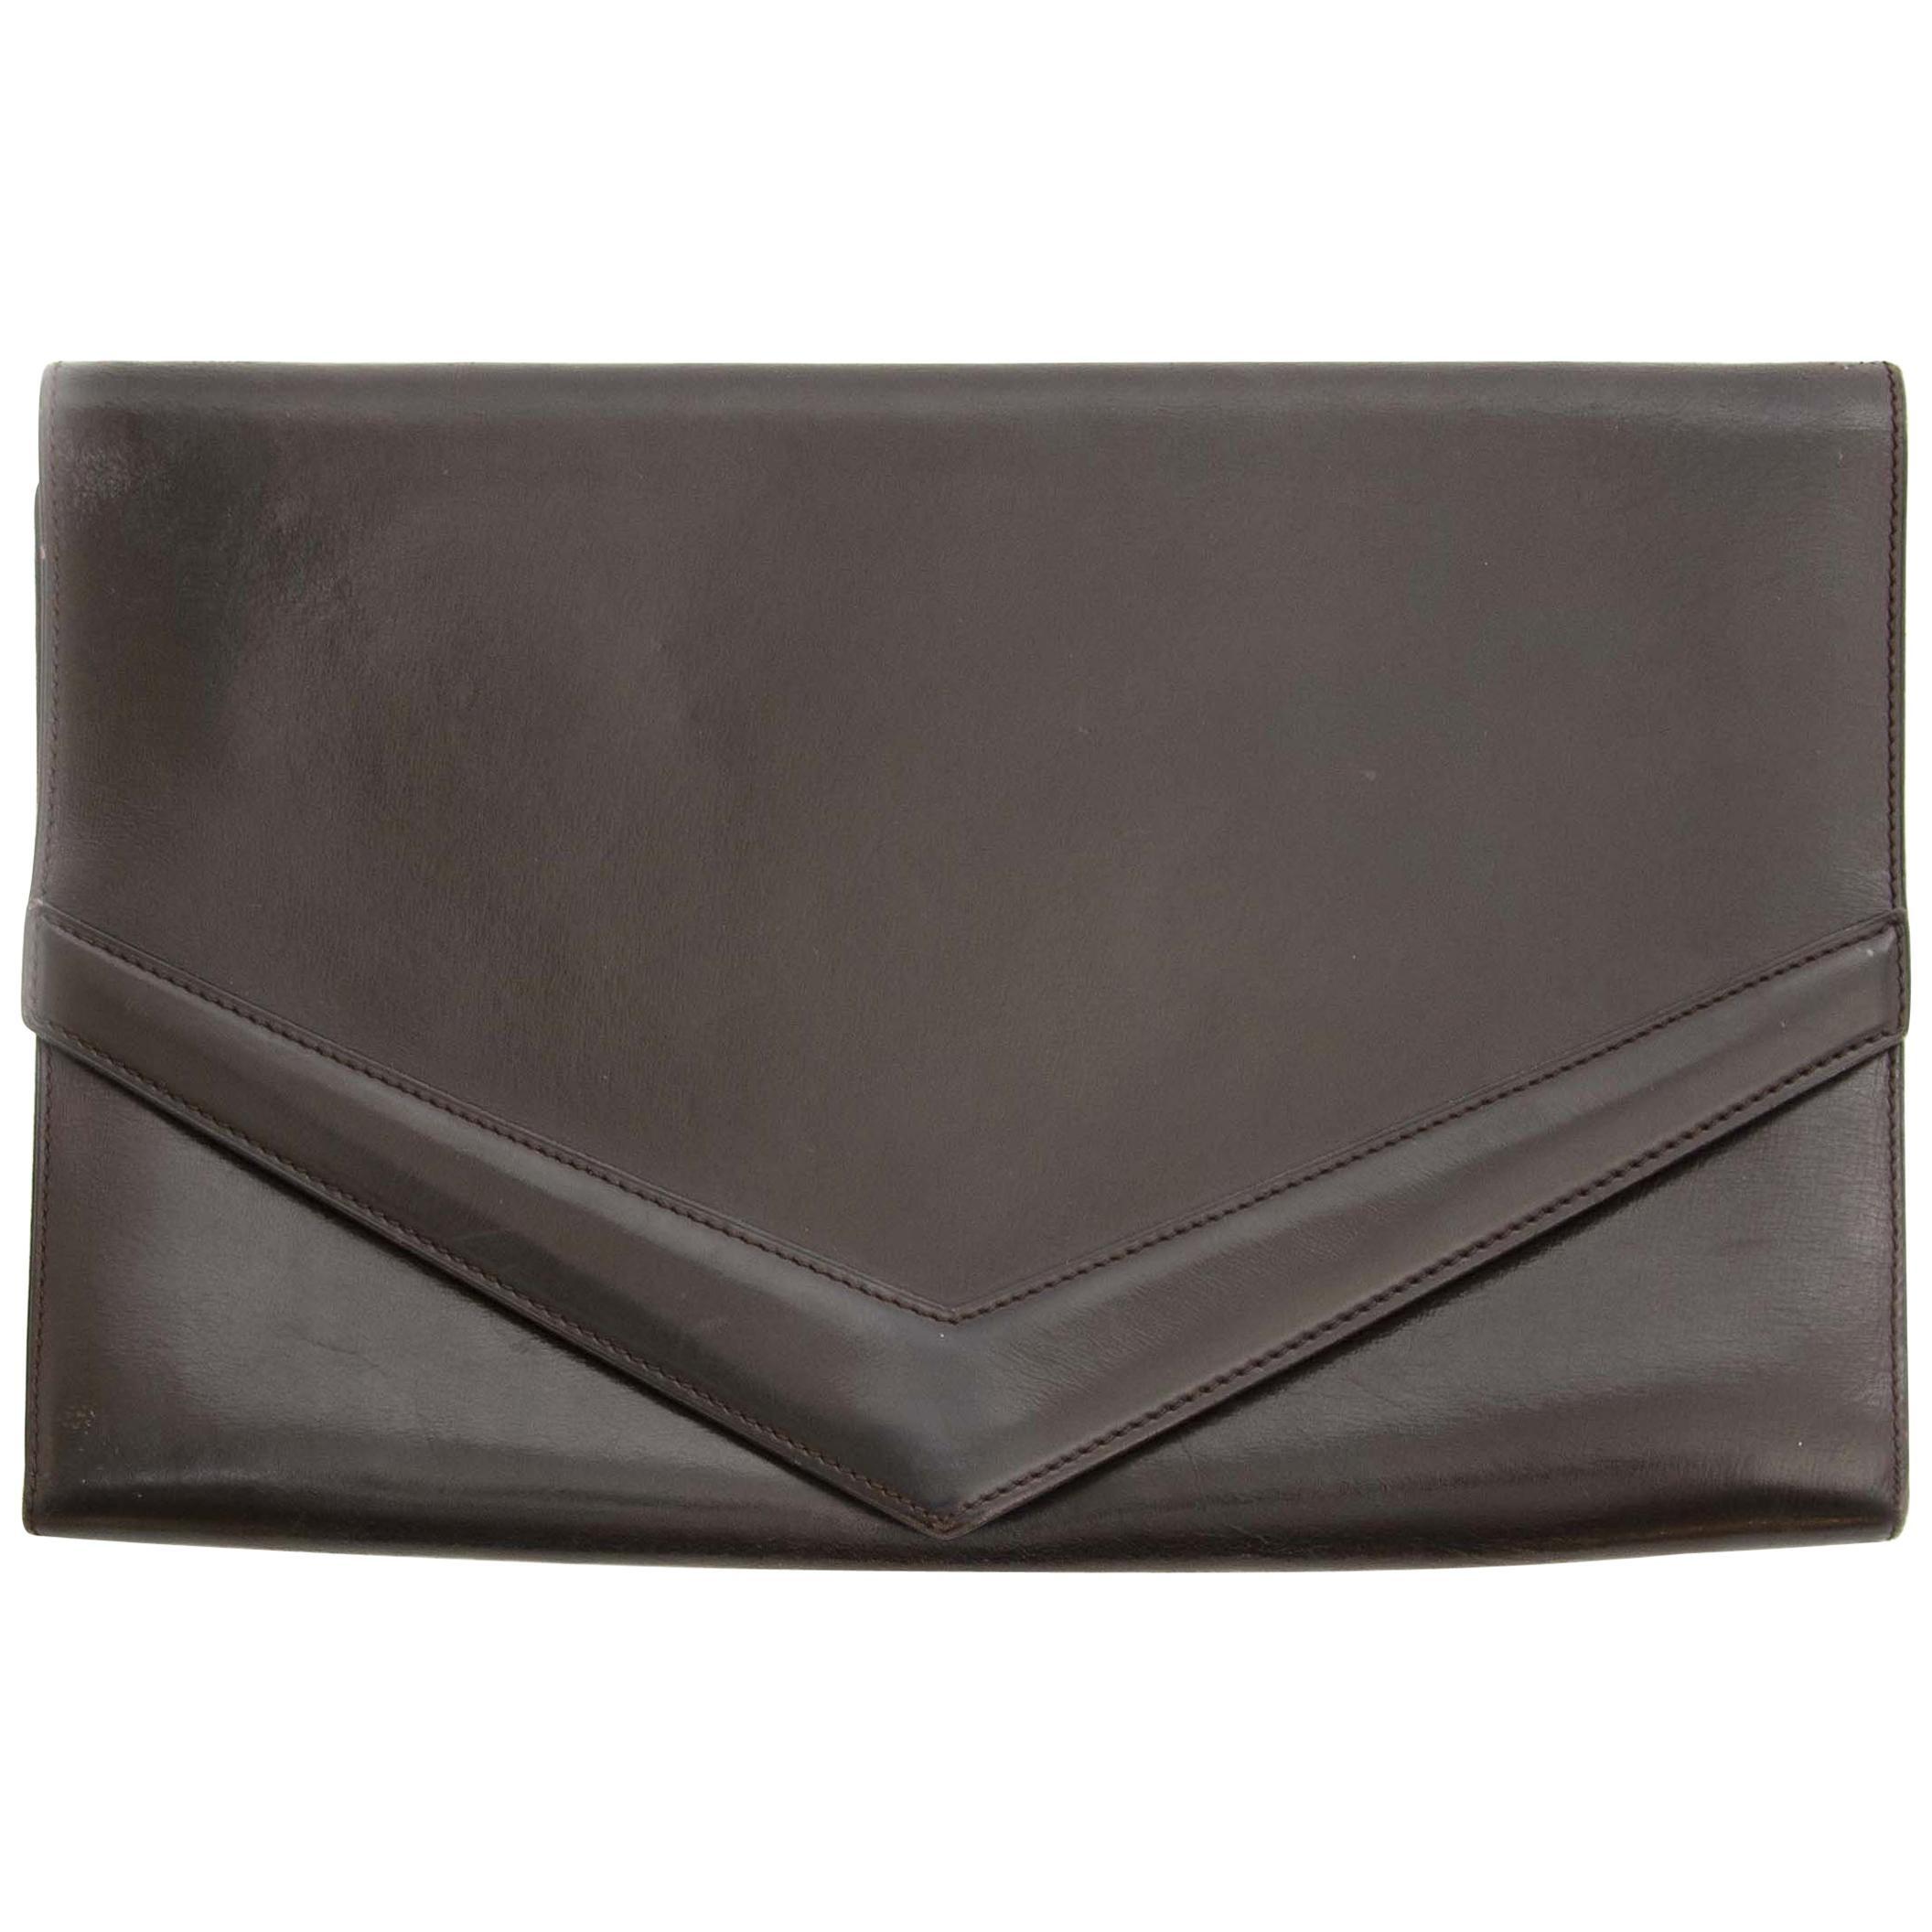 Delvaux Dark Brown Leather Clutch